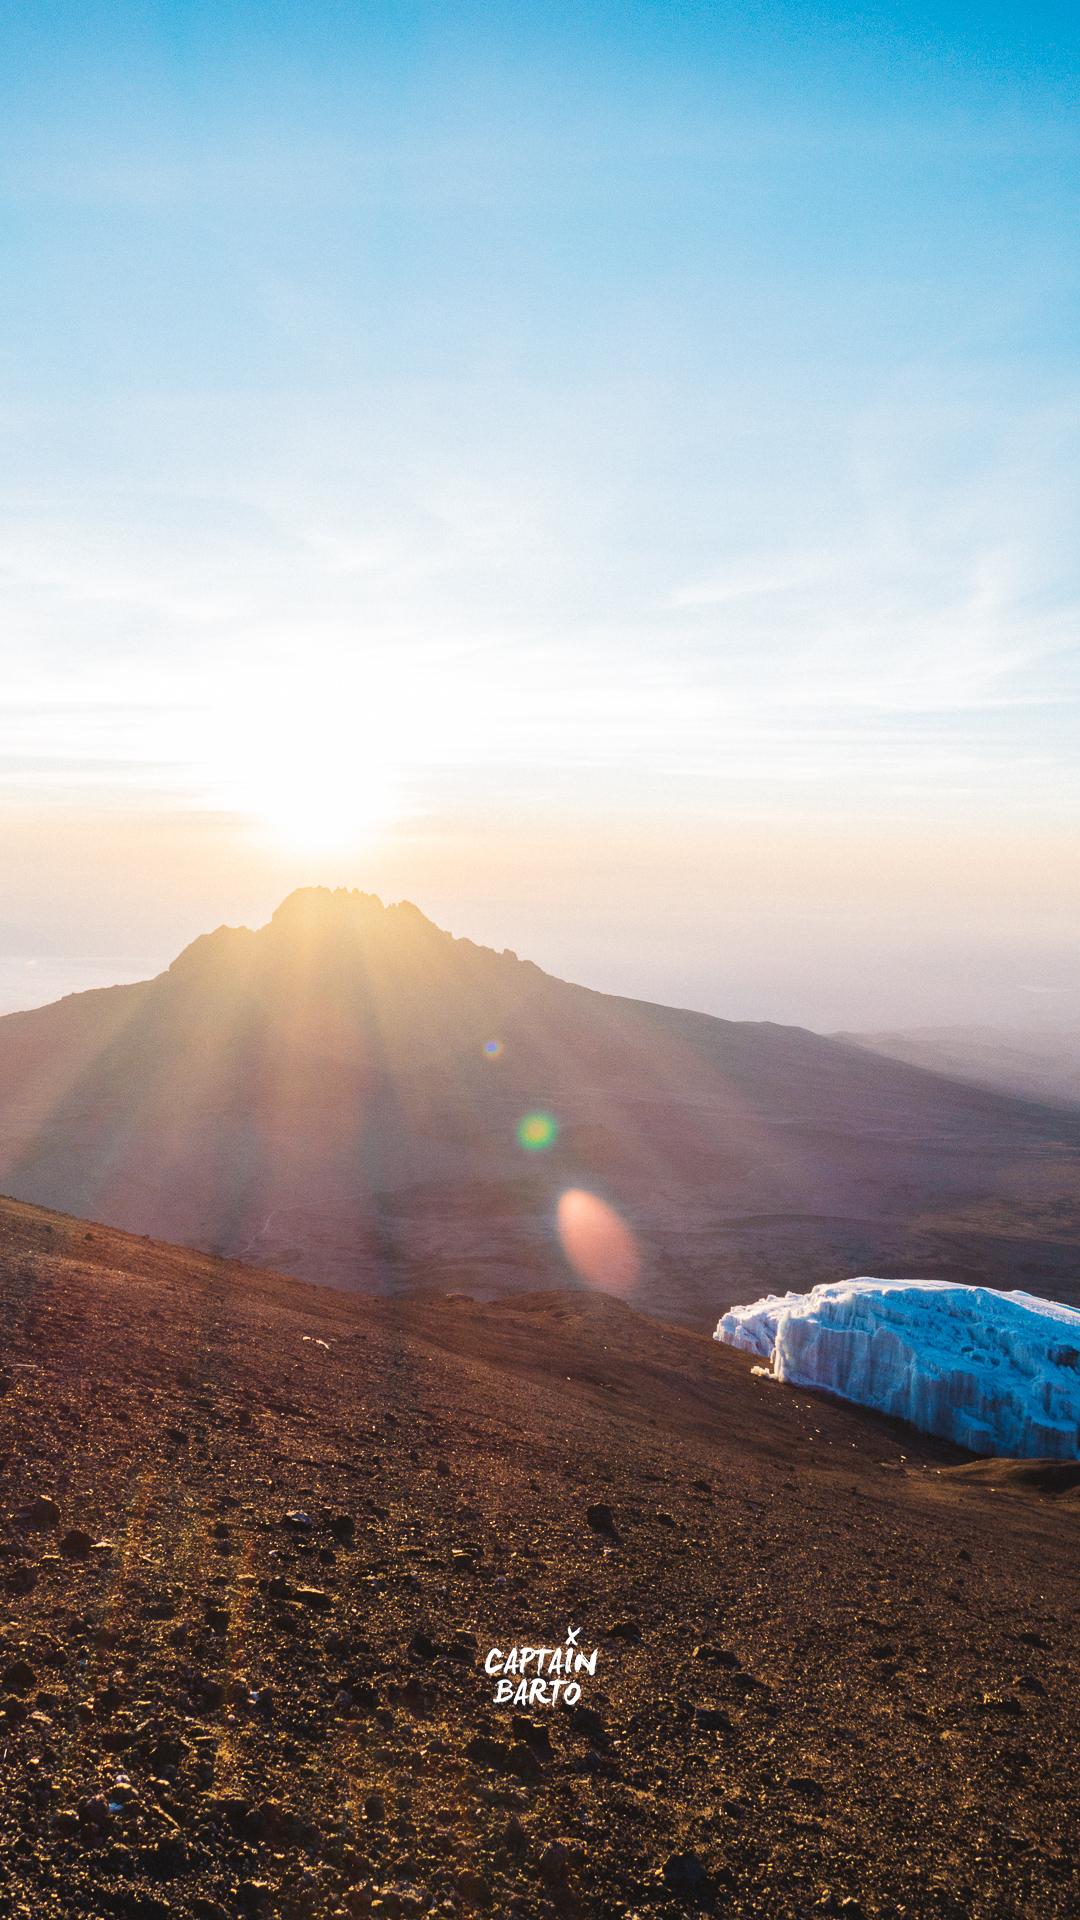 captainbarto-blog-wallpaper-climbing-mtkilimanjaro-110817-11.jpg